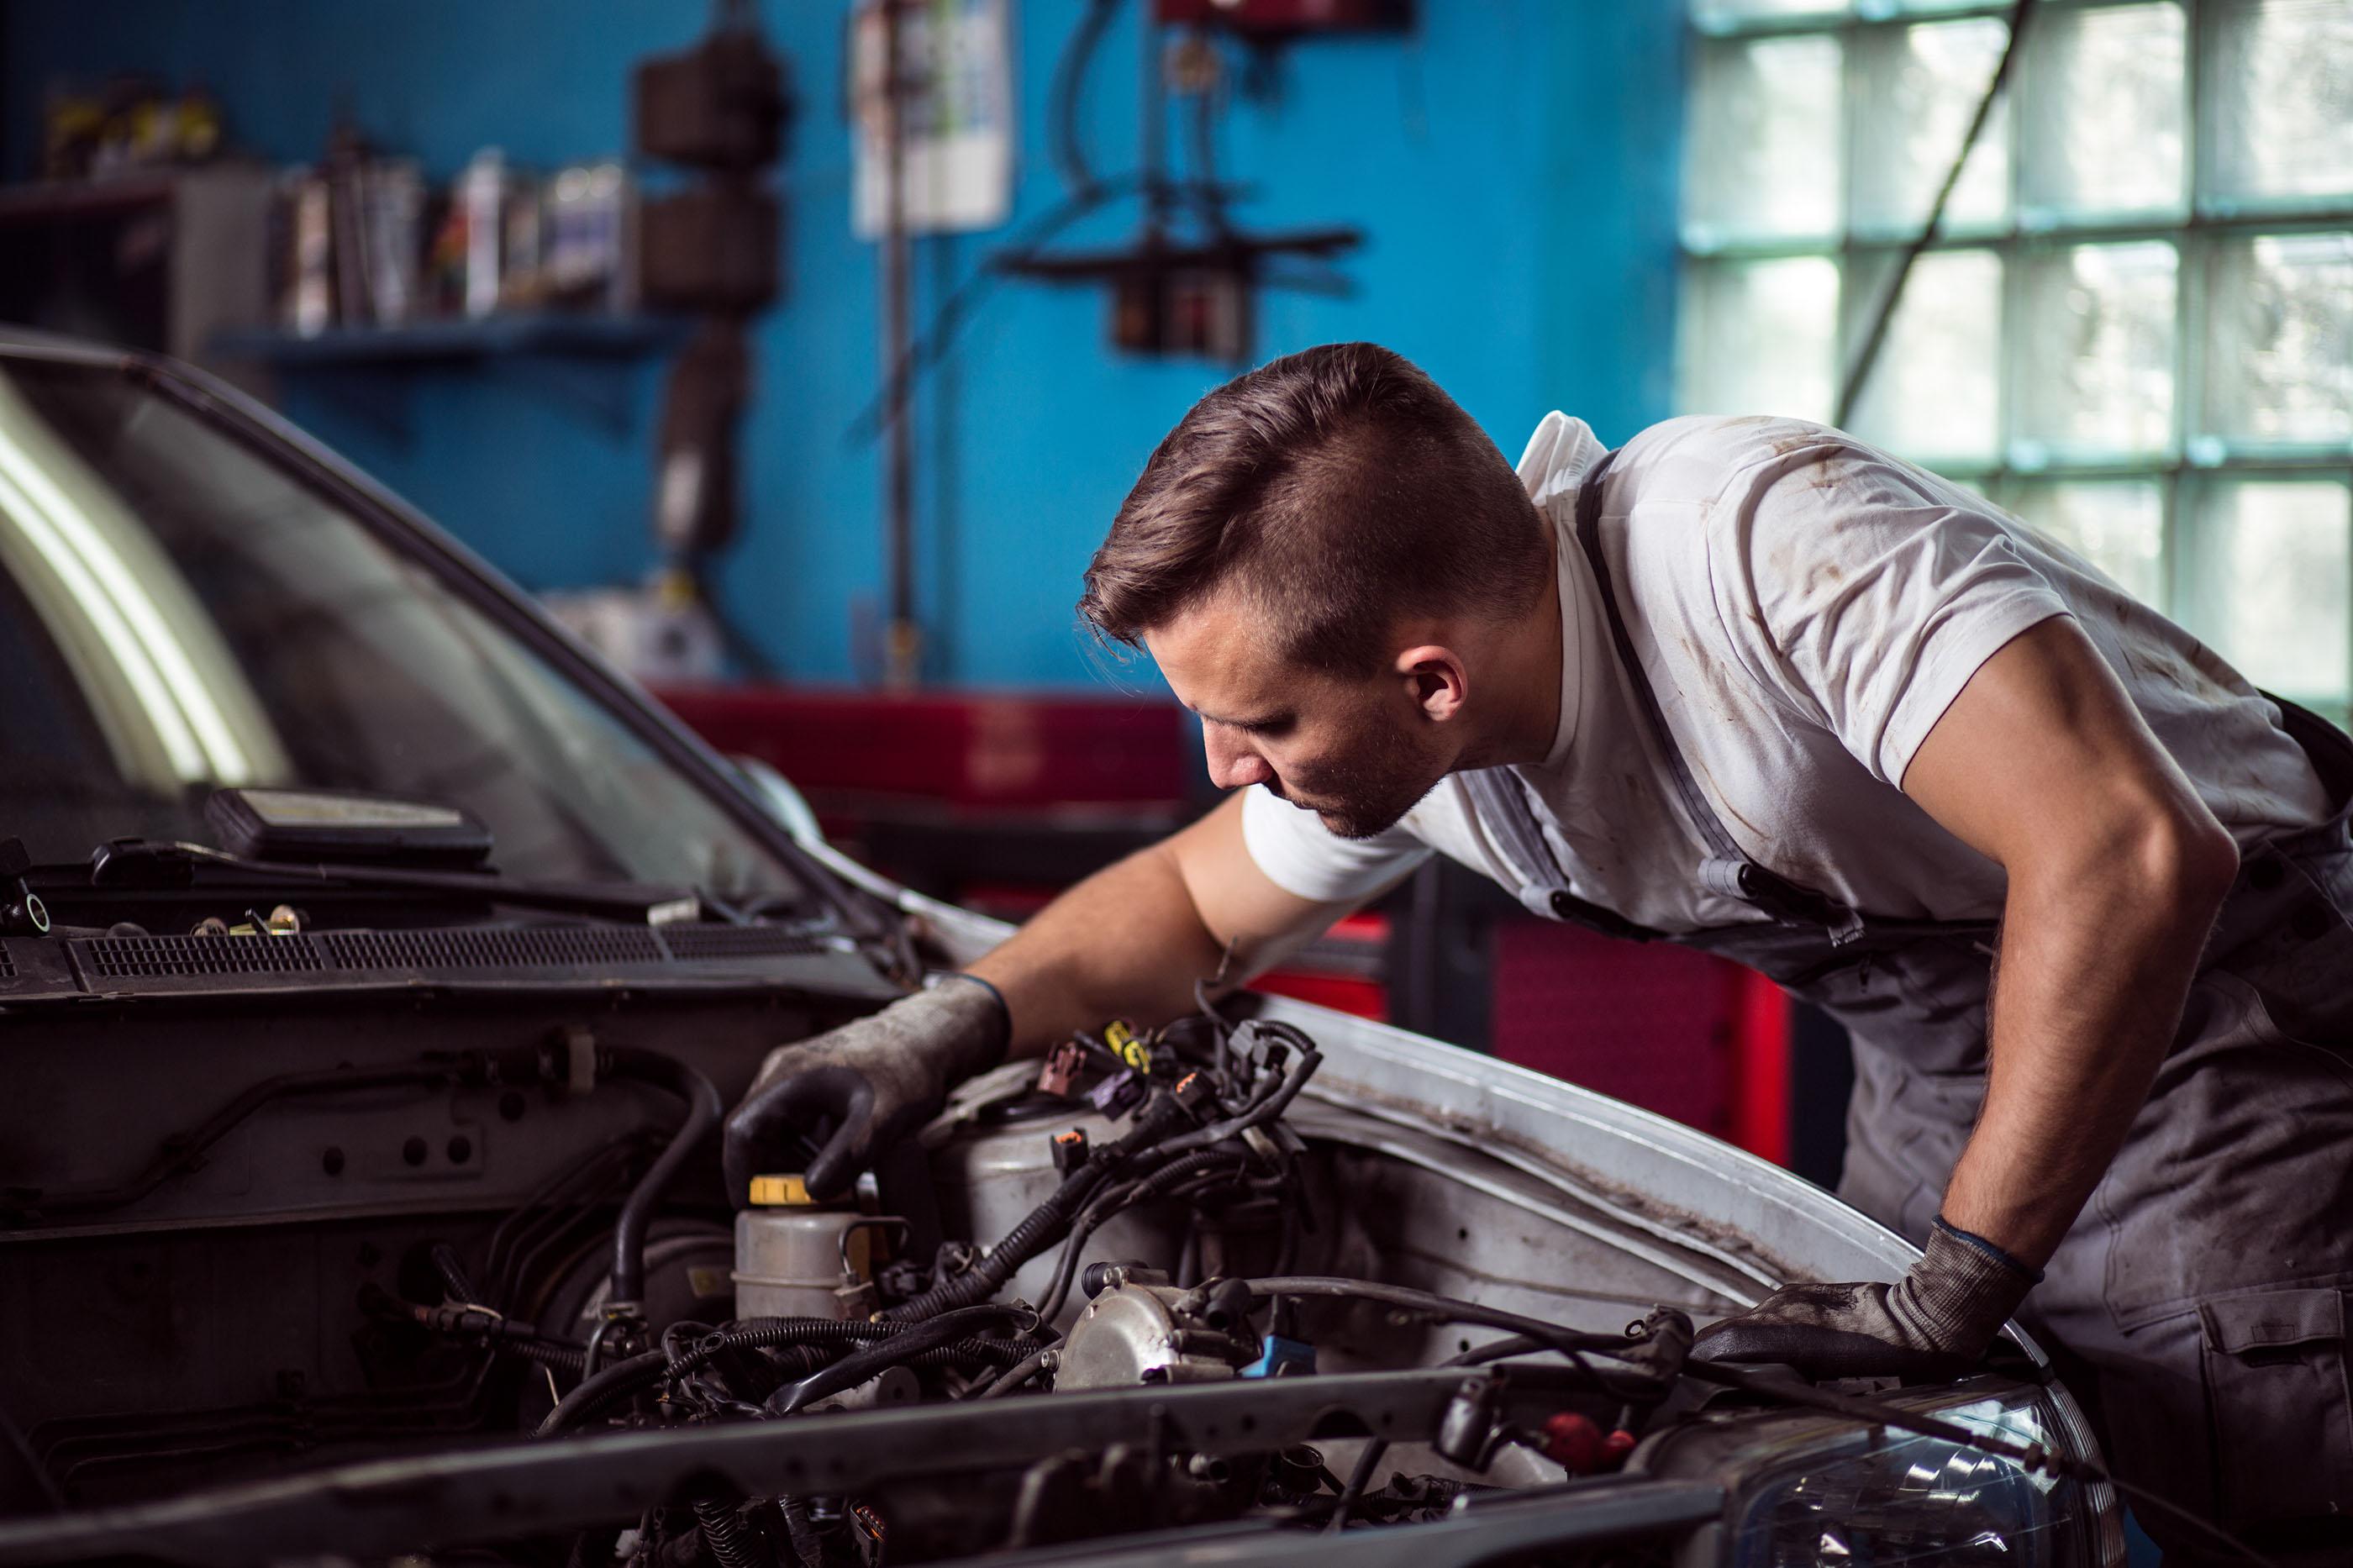 wide mitsubishi auto repair wallpapers mo columbia mechanic car engine in shop